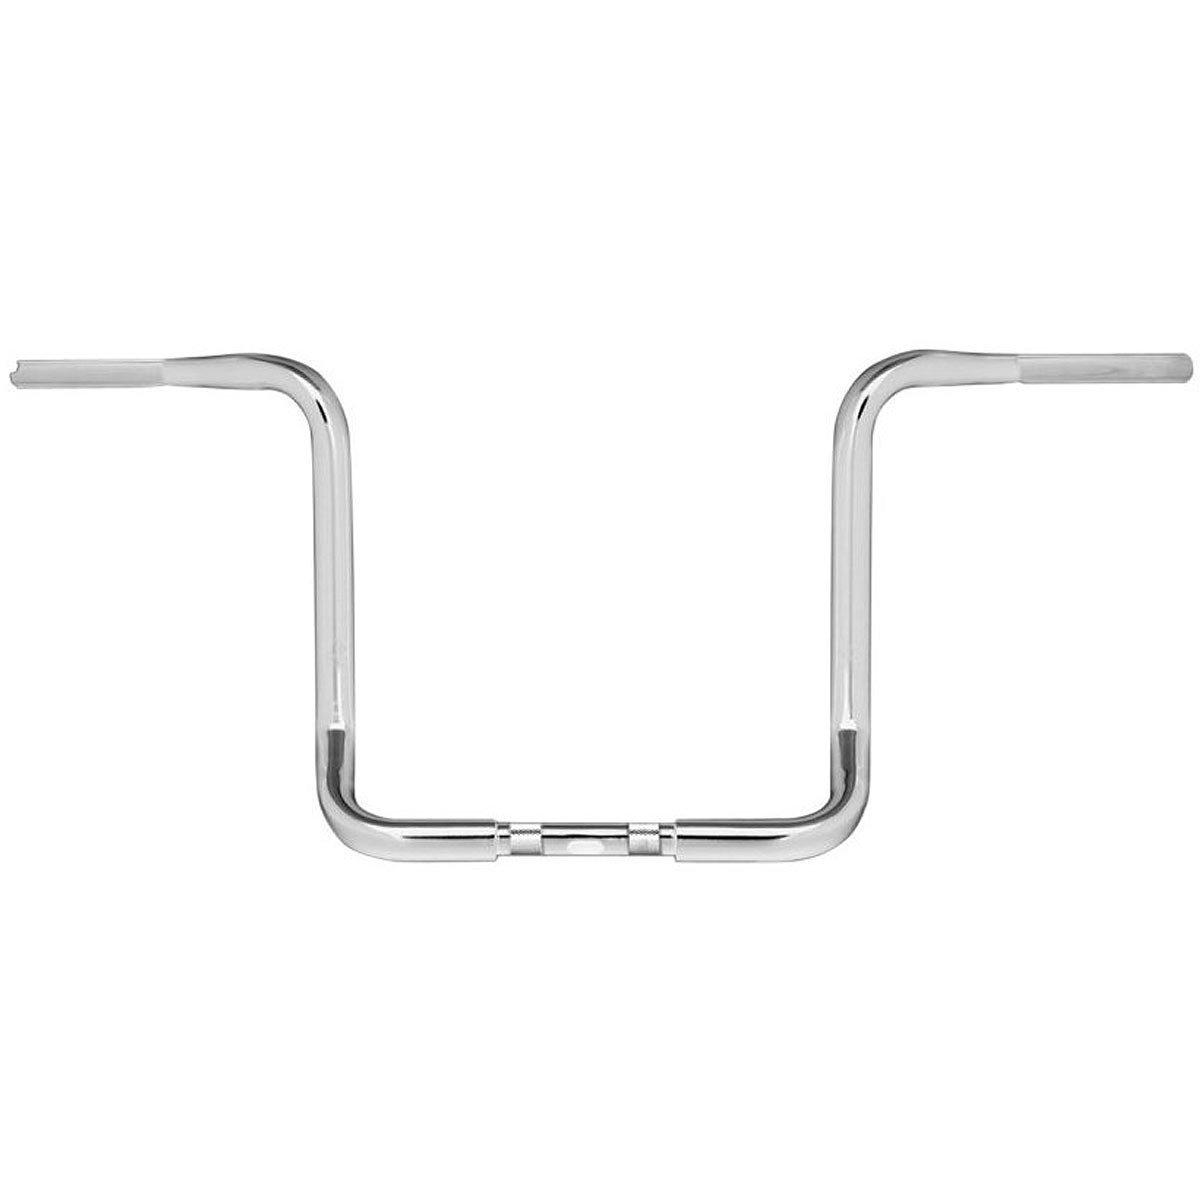 Burly B12-2001C 1.25'' Tube Bagger Bar, 1 Pack